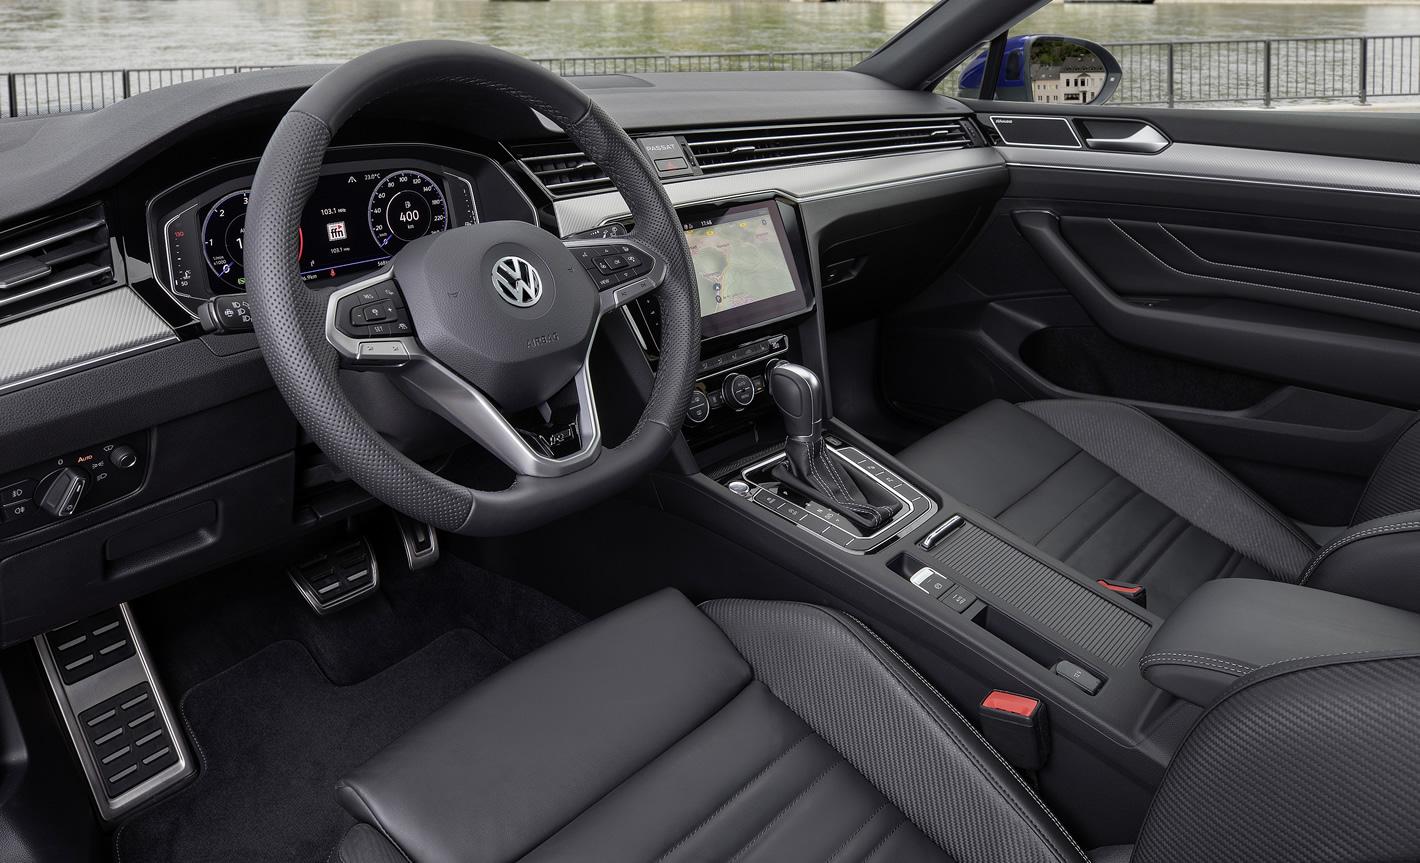 Nowy Volkswagen Passat w środku